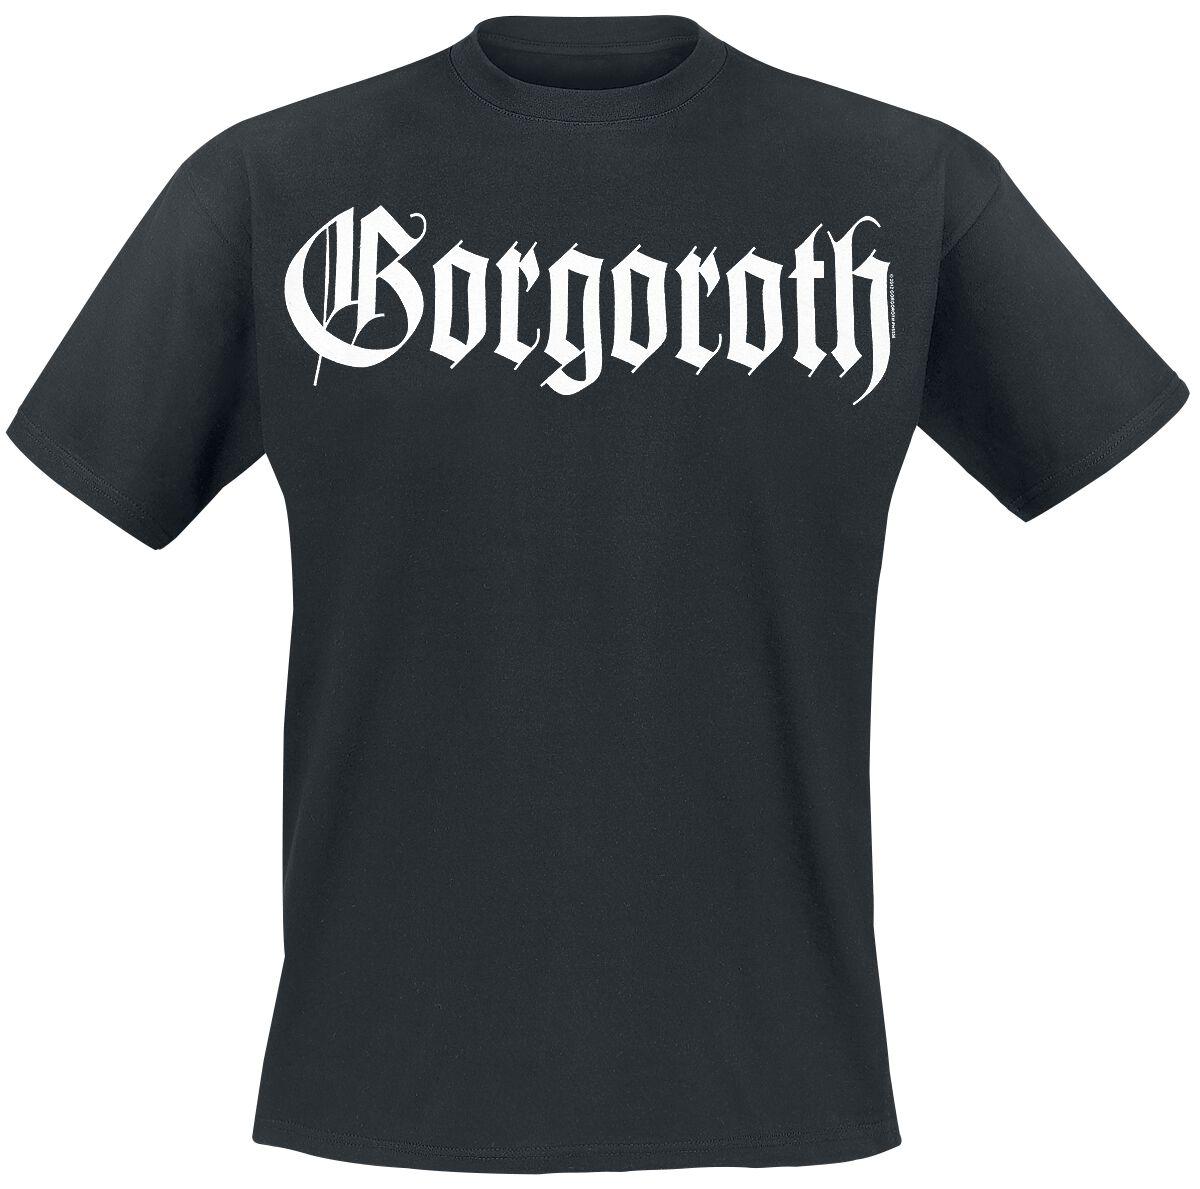 Zespoły - Koszulki - T-Shirt Gorgoroth True Black Metal T-Shirt czarny - 286888